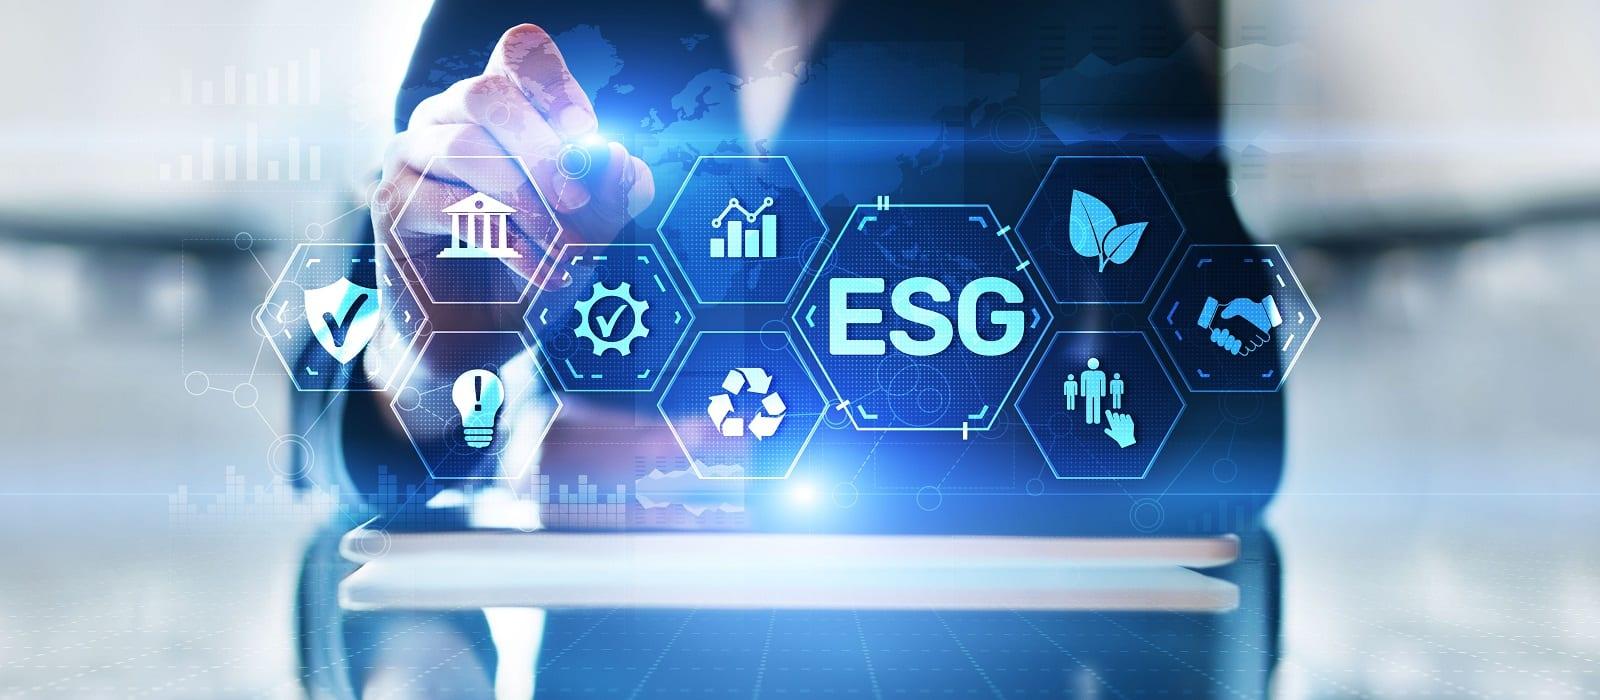 ESG Environment social governance investment business concept on screen